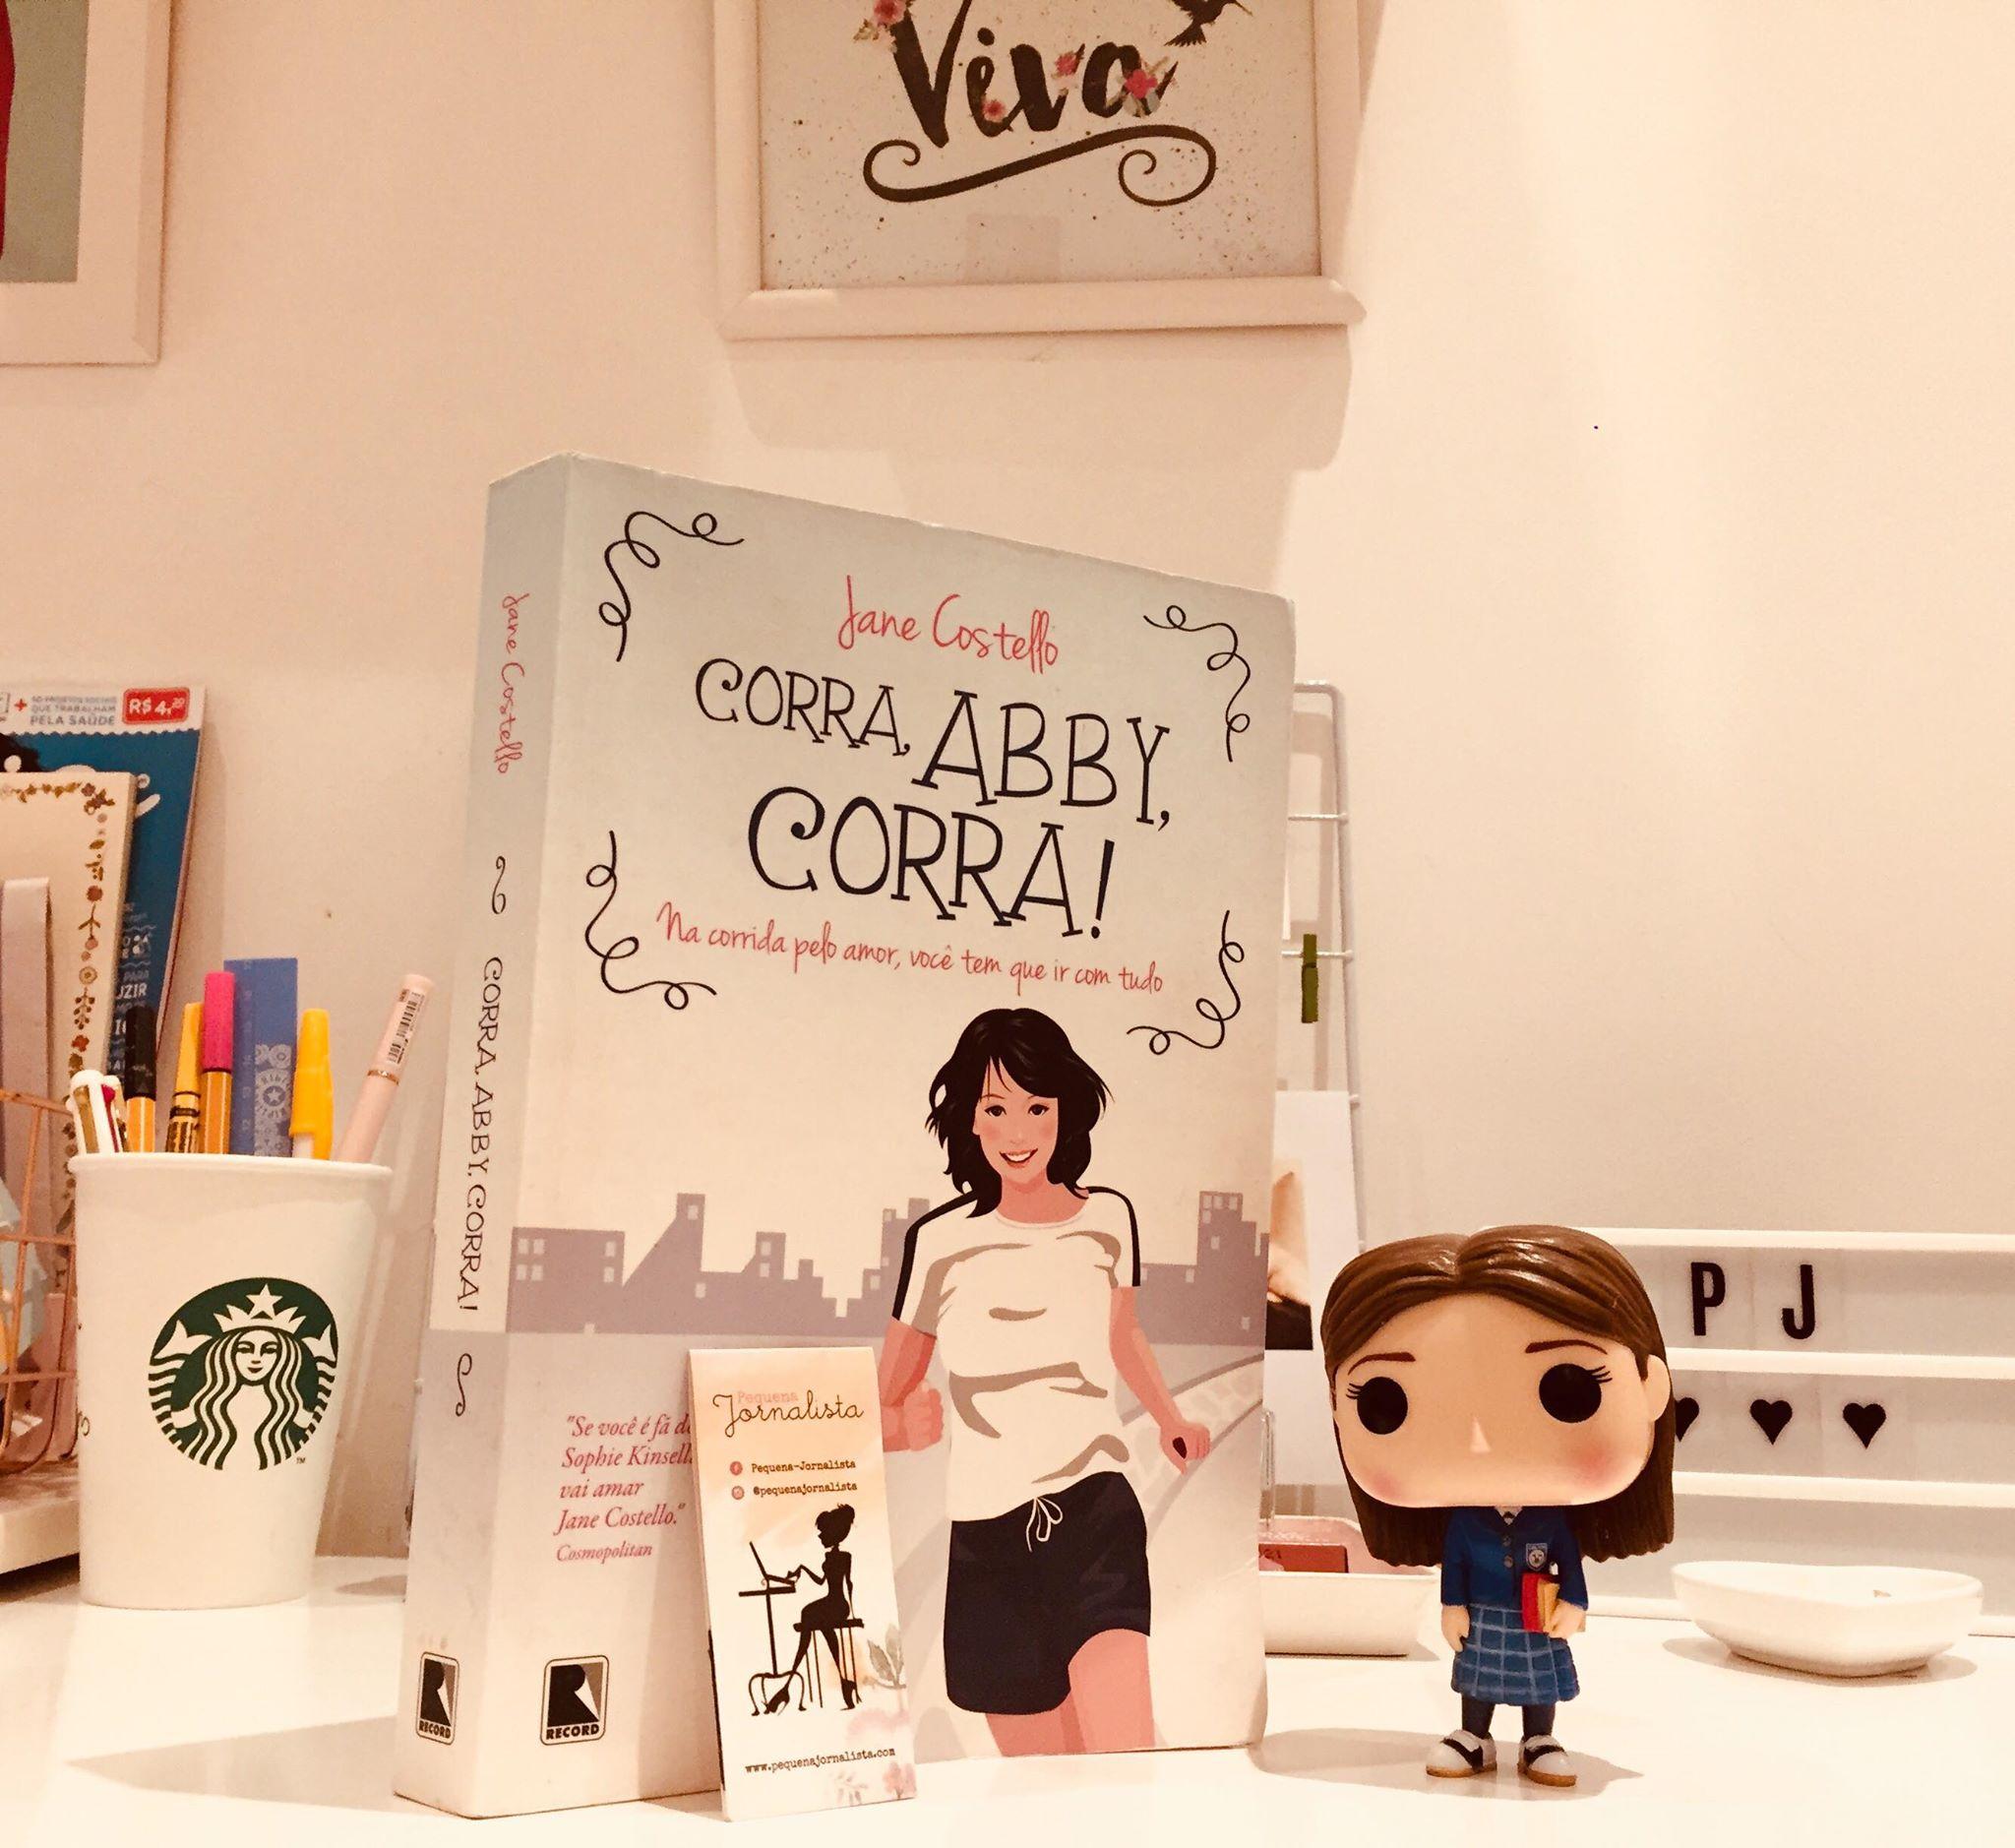 PJ Leu - Corra Abby Corra